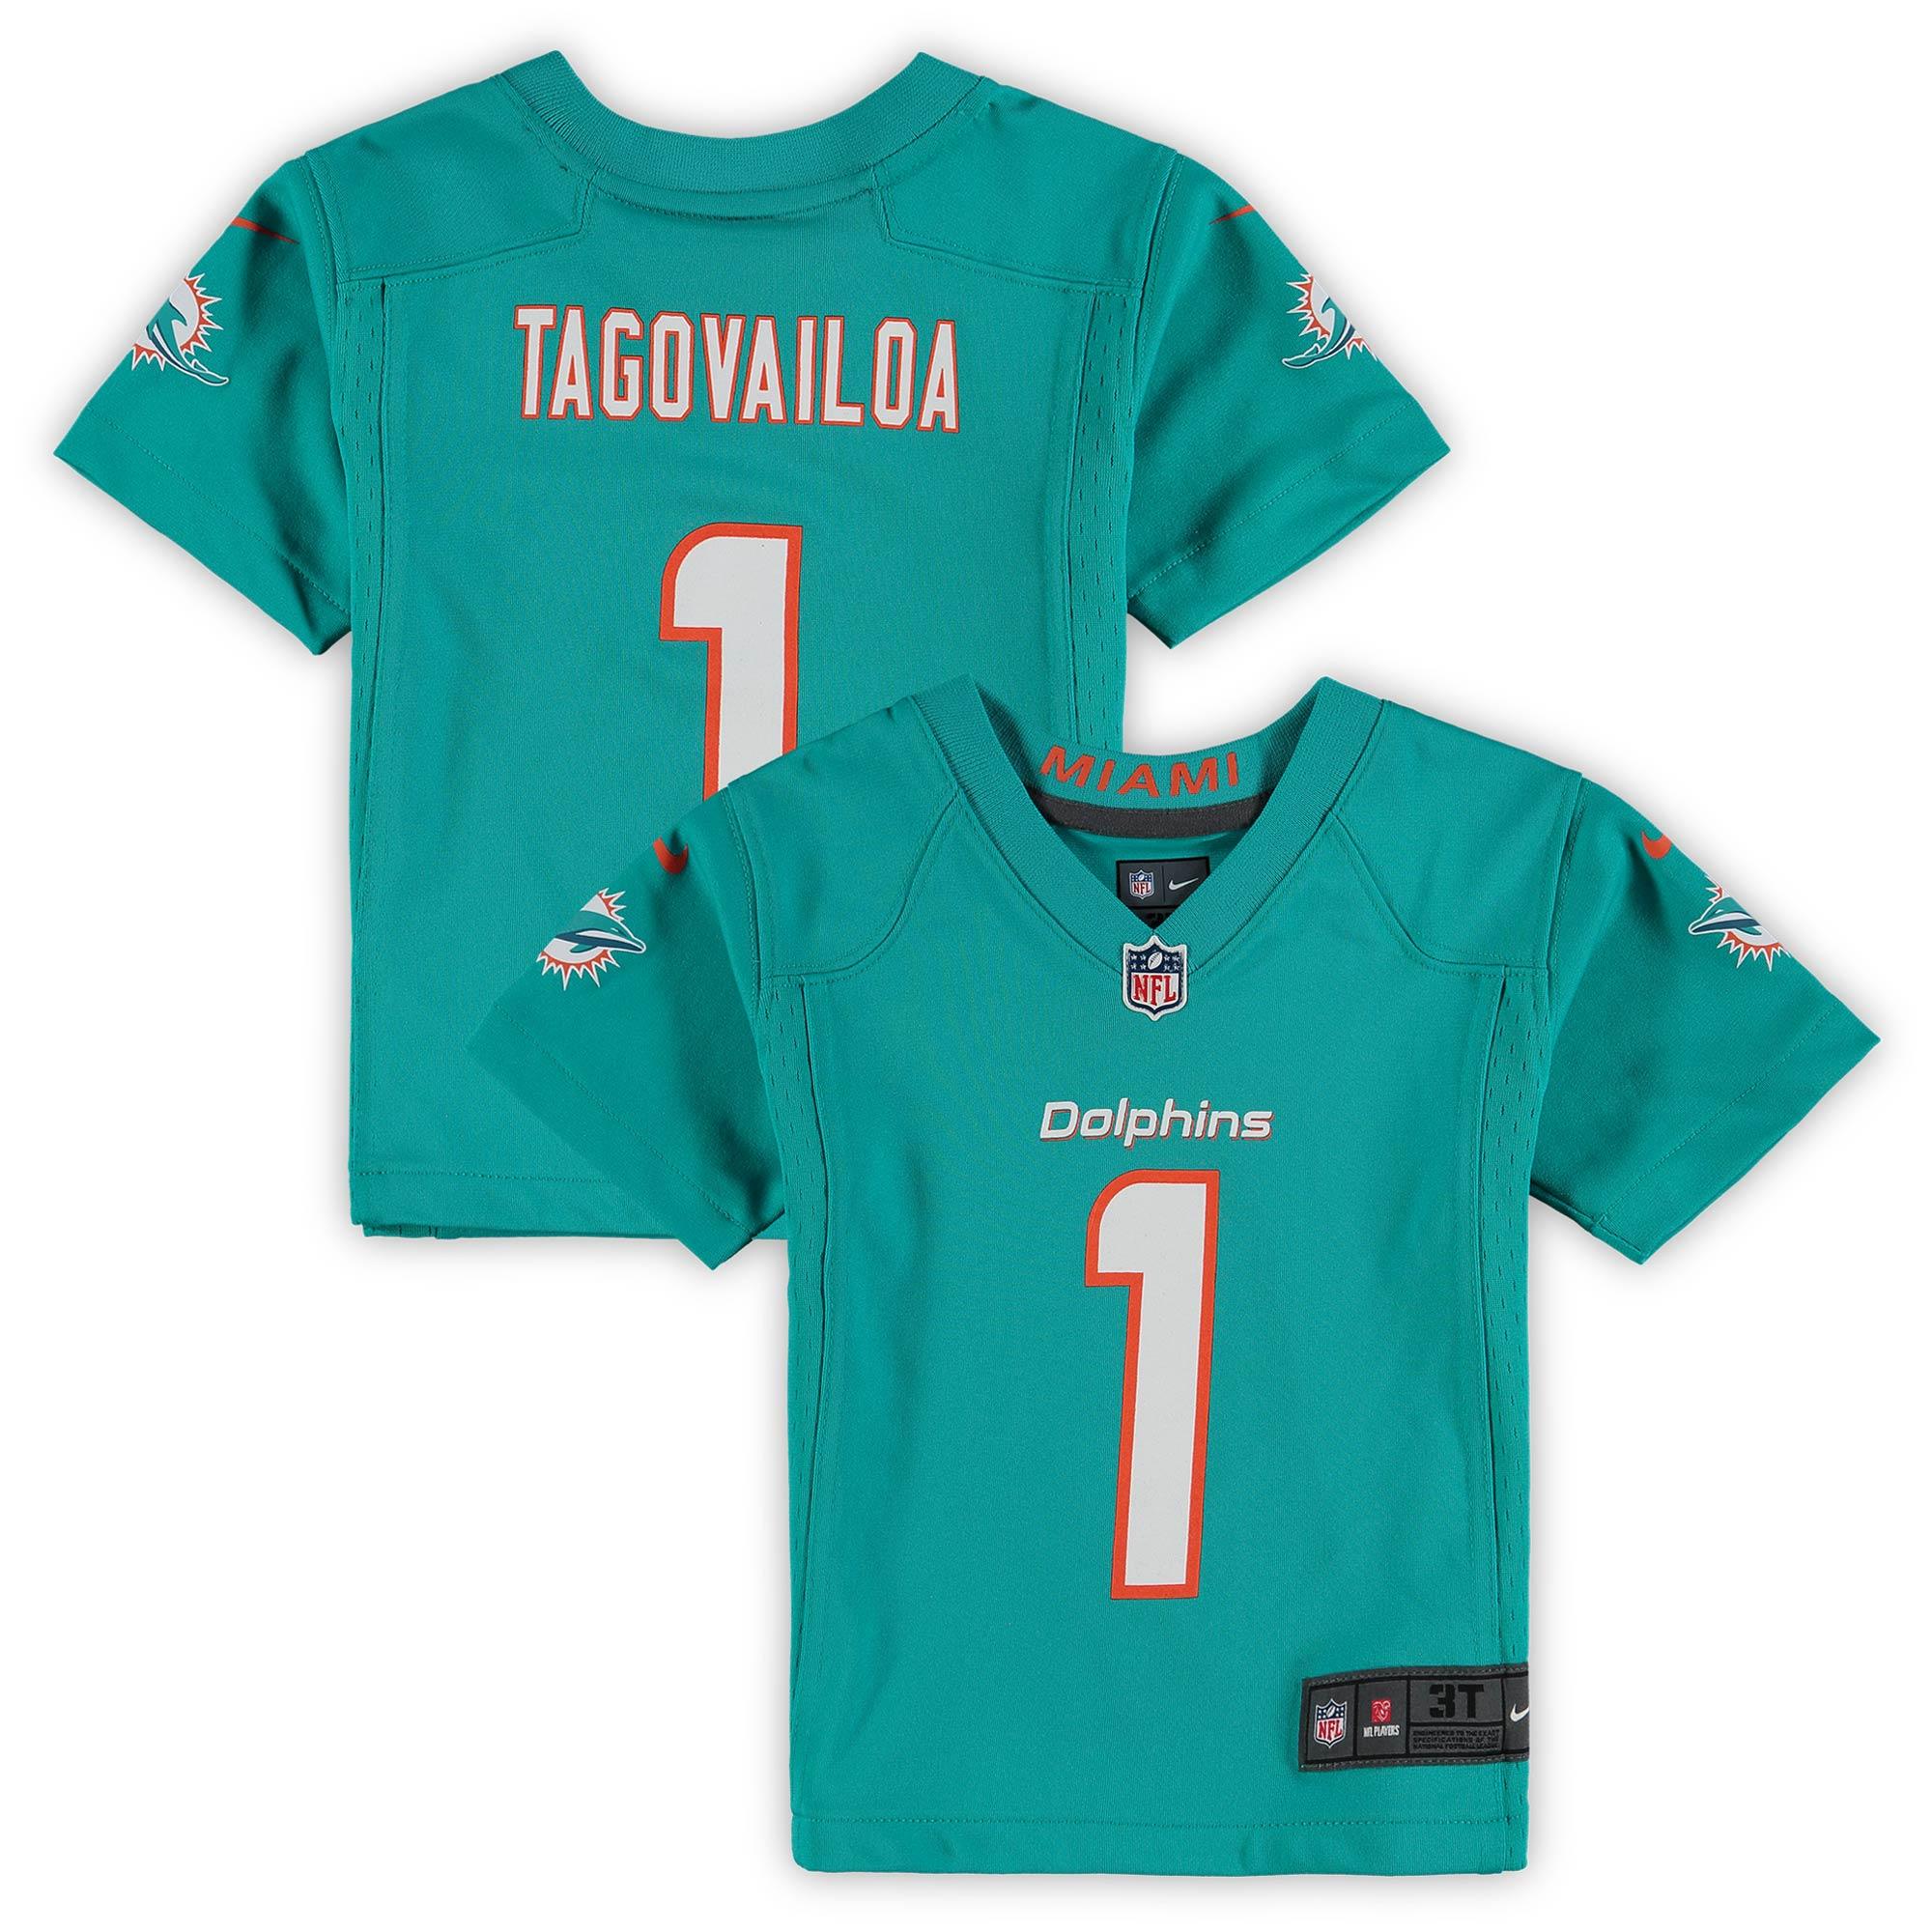 Tua Tagovailoa Miami Dolphins Nike Toddler Game Jersey - Aqua